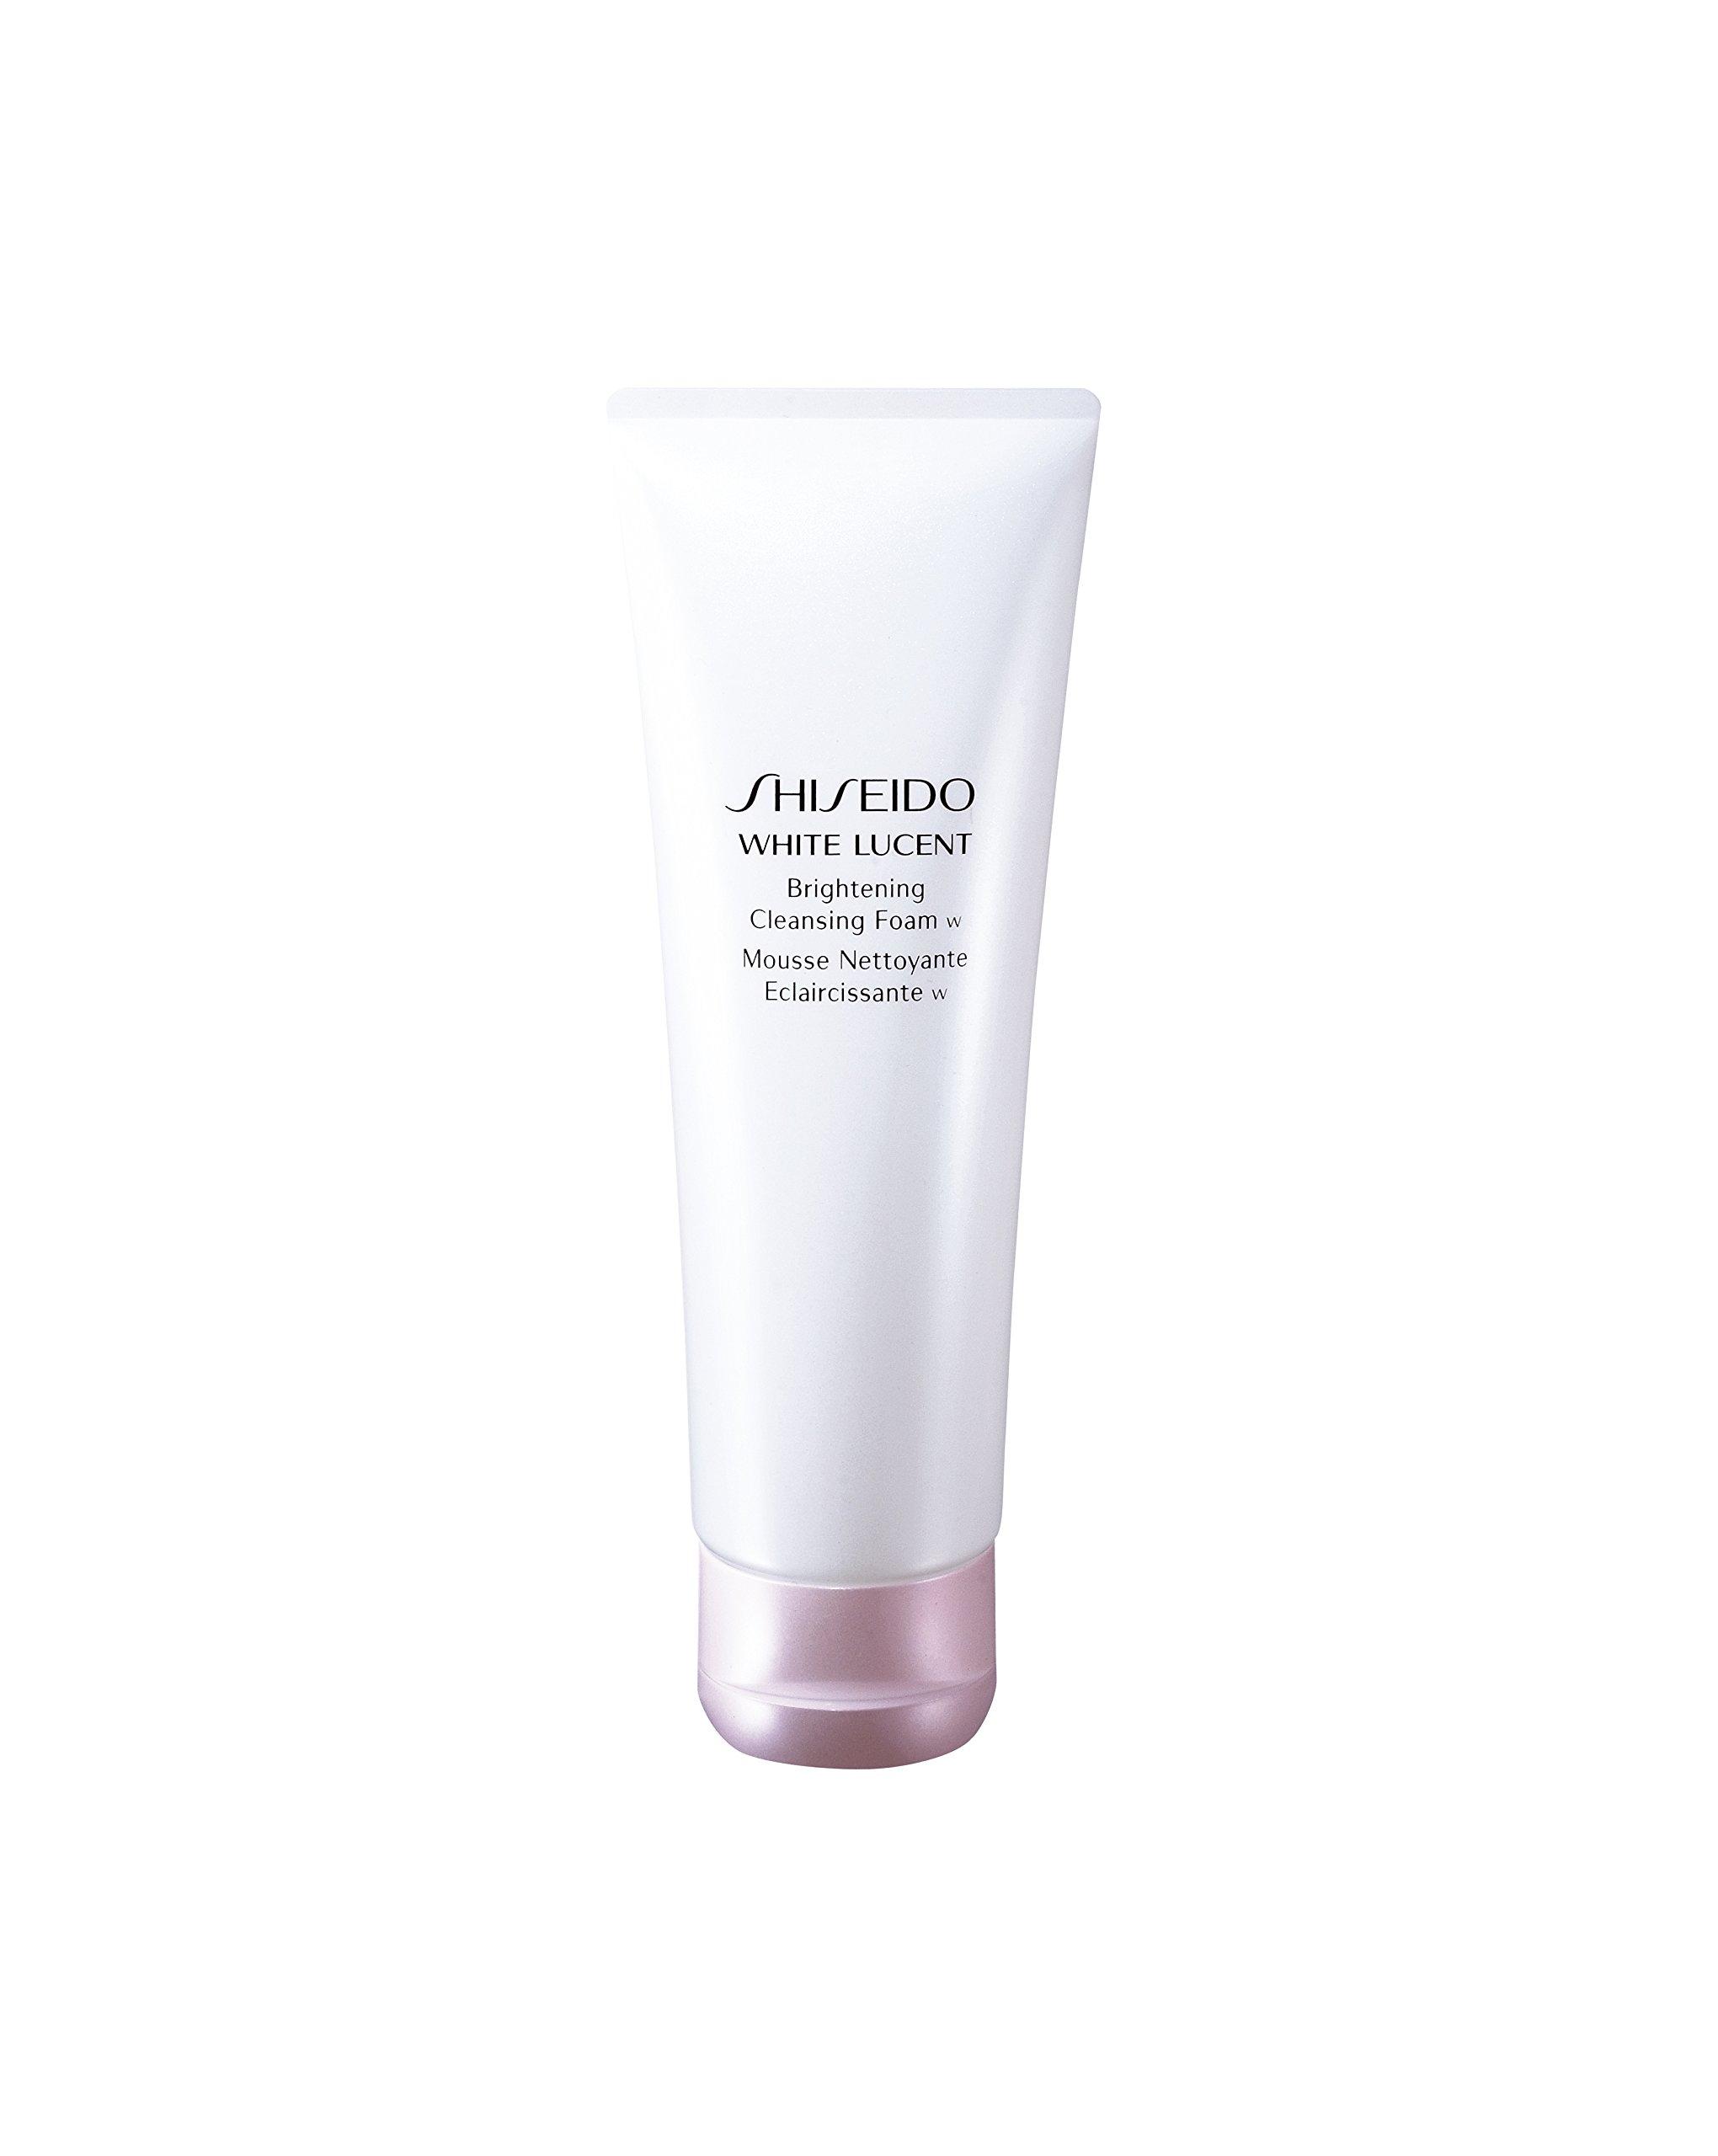 Shiseido White Lucent Brightening Cleansing Foam for Unisex, 4.7 Oz